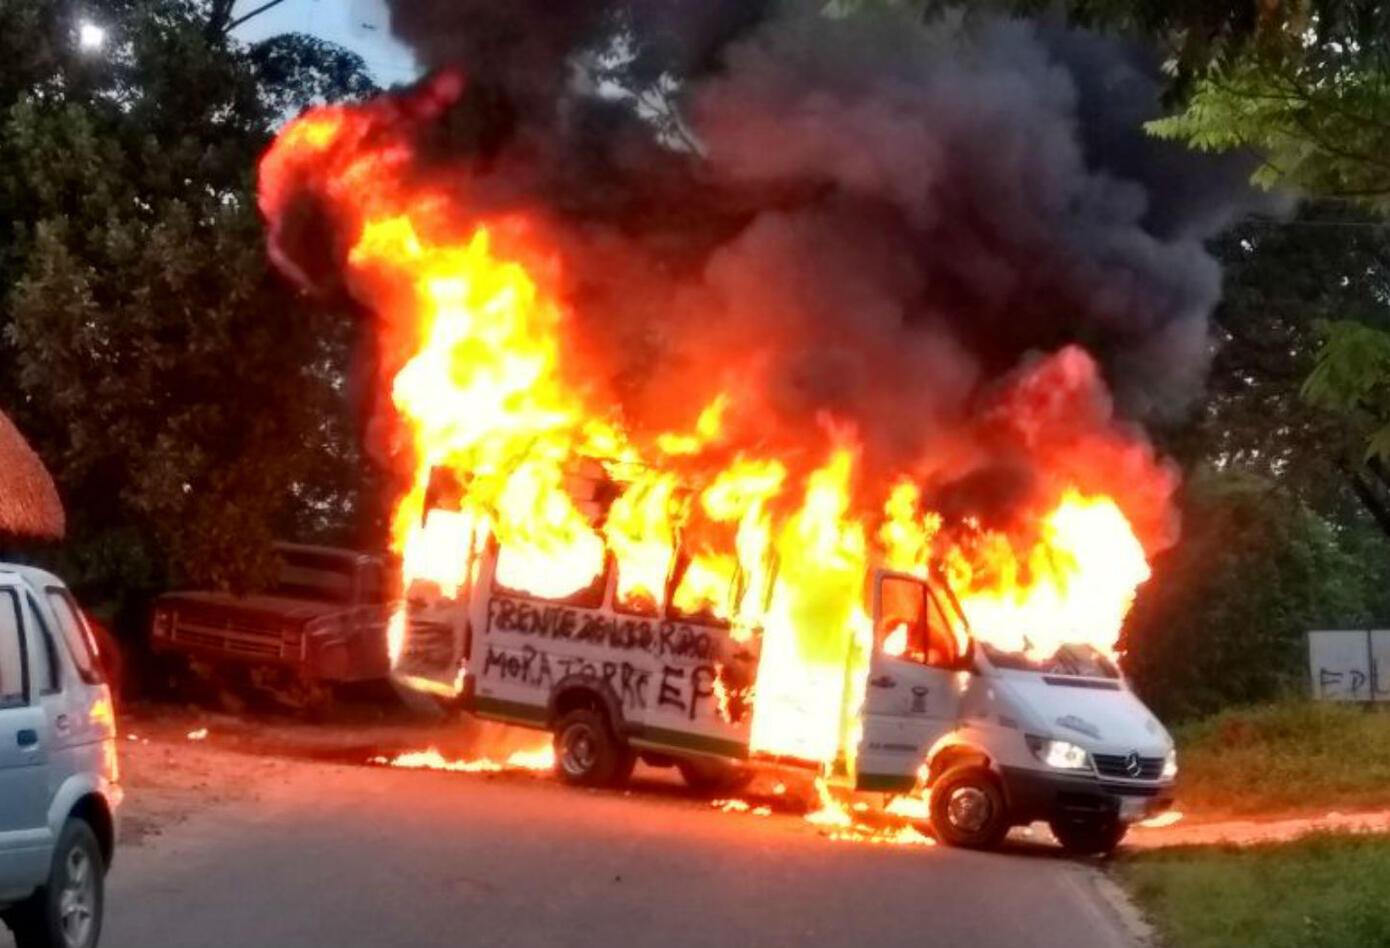 Bus quemado en Catatumbo